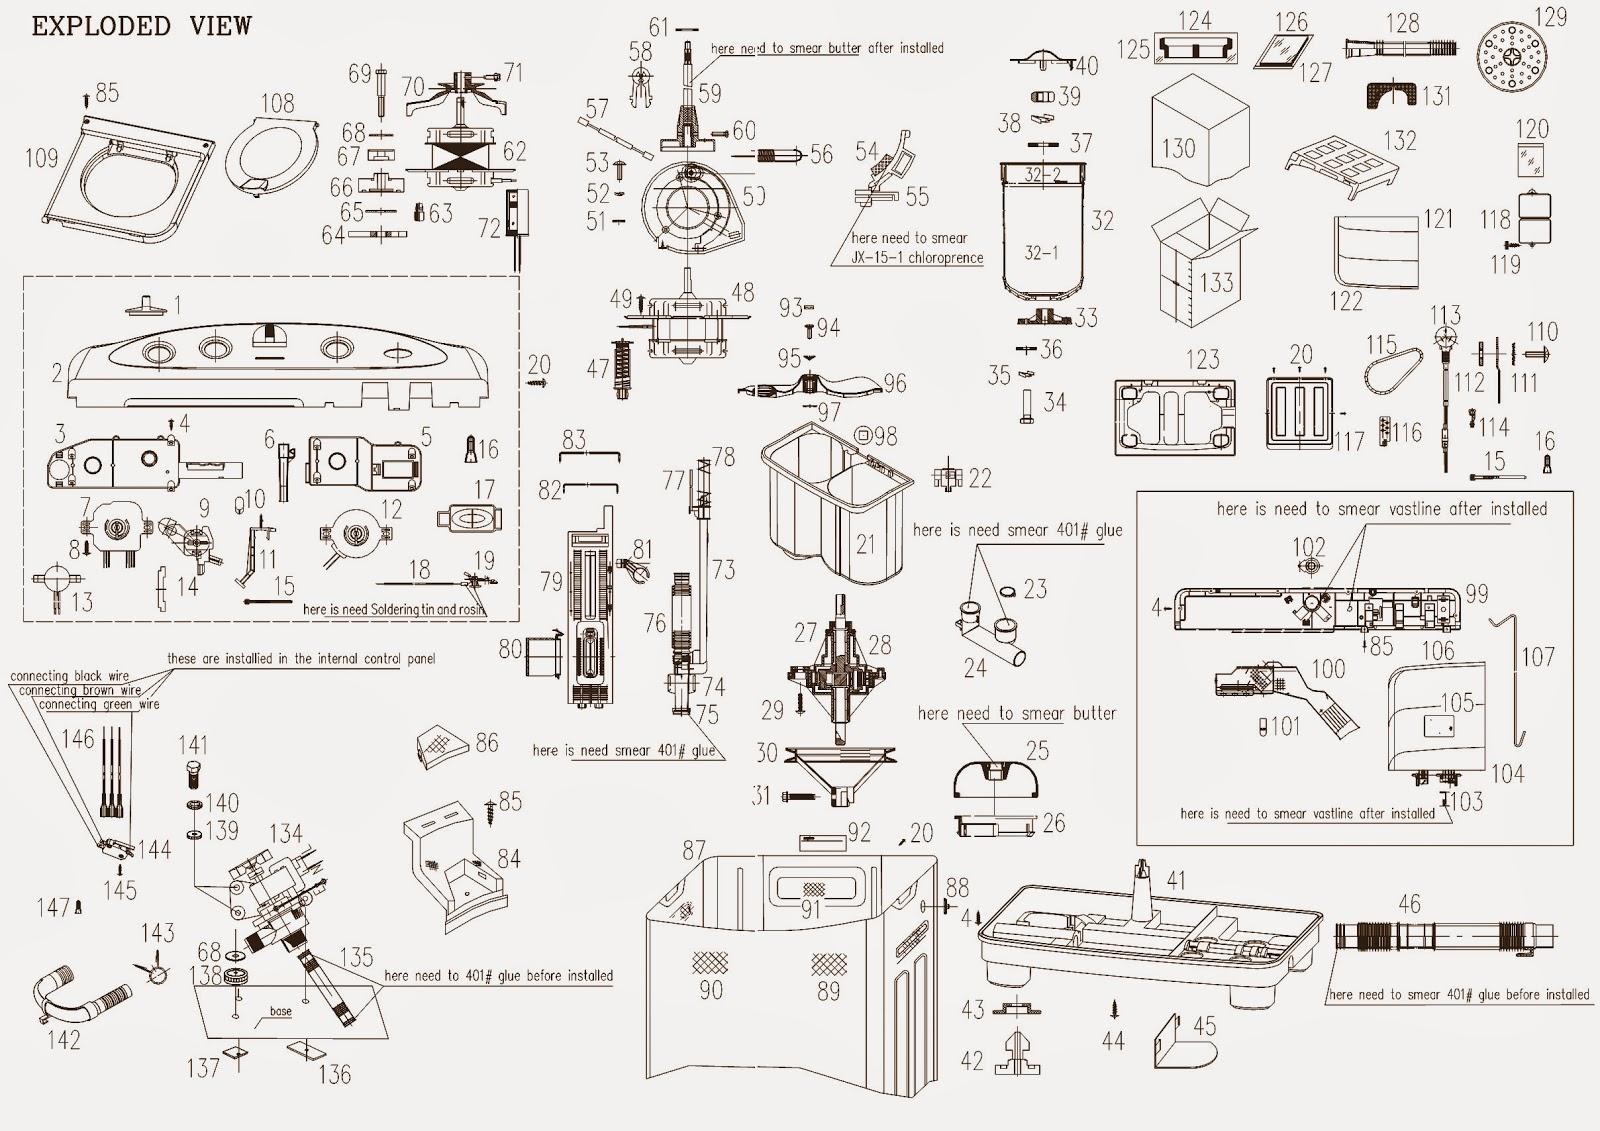 washing machine motor wiring diagram 3 phase 9 leads electro help sanyo sw 7010t 7010tp